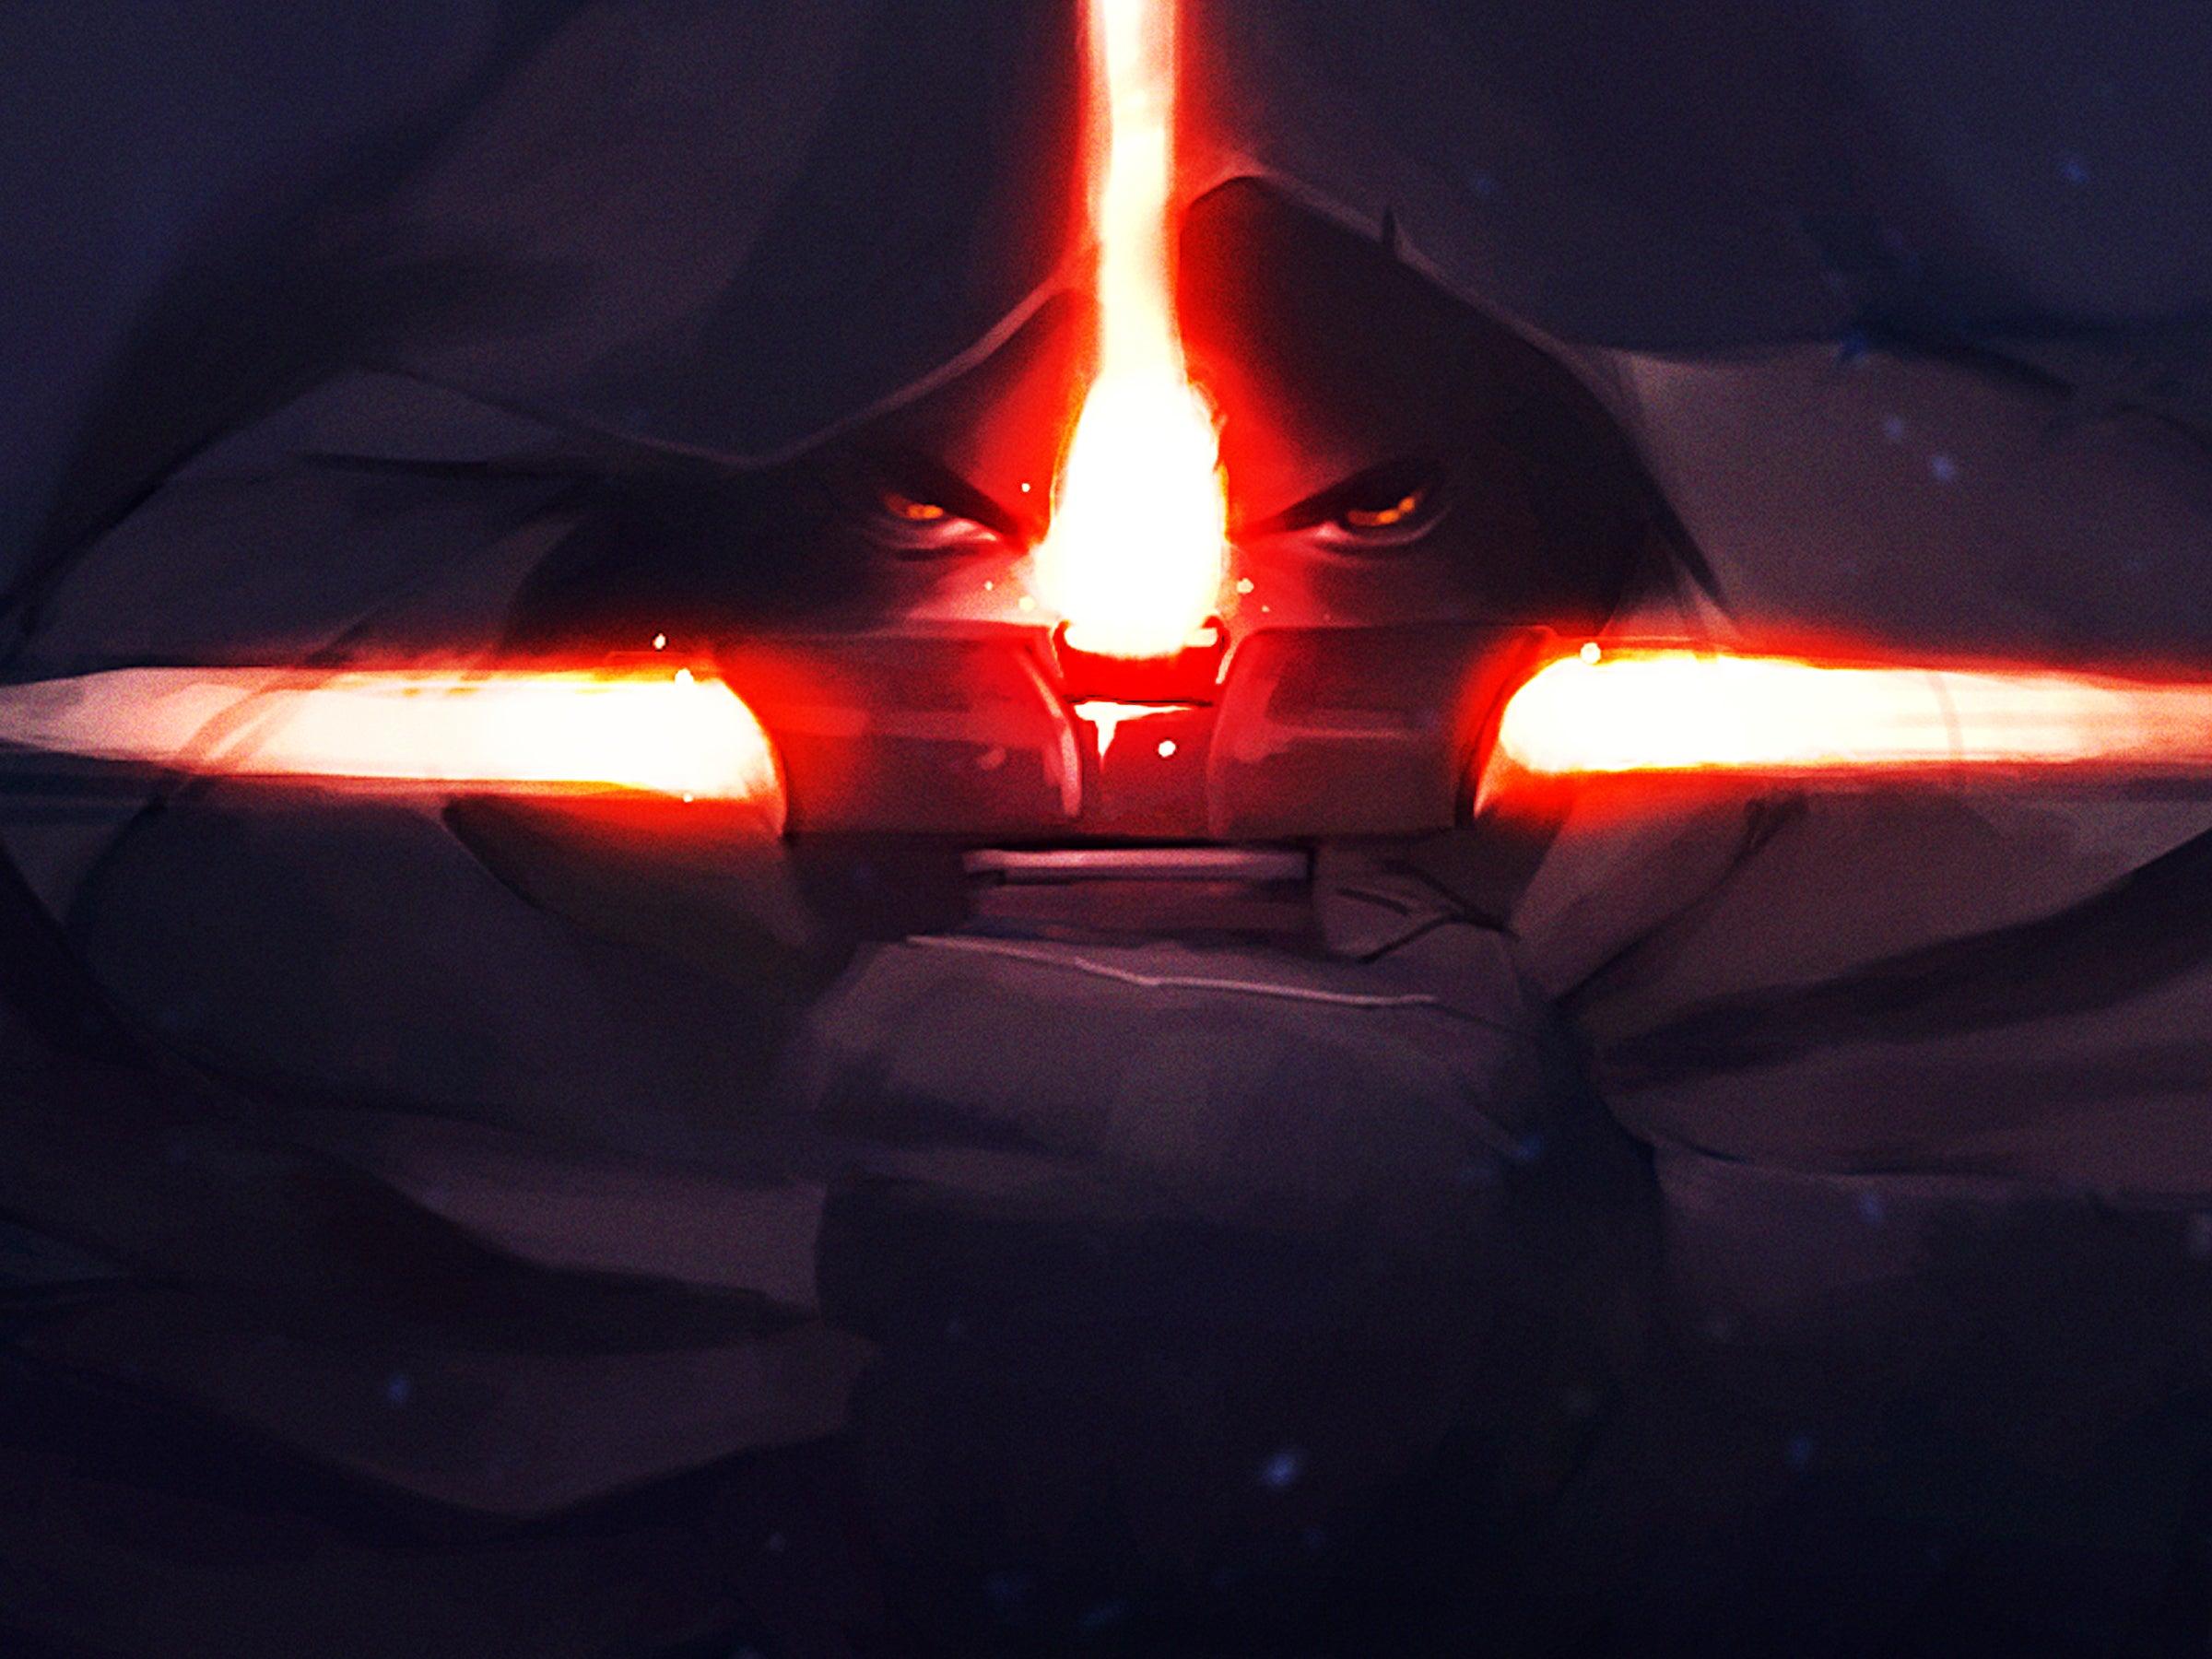 Real Swordsmen Weigh In On Star Wars's Weird Triple Lightsaber